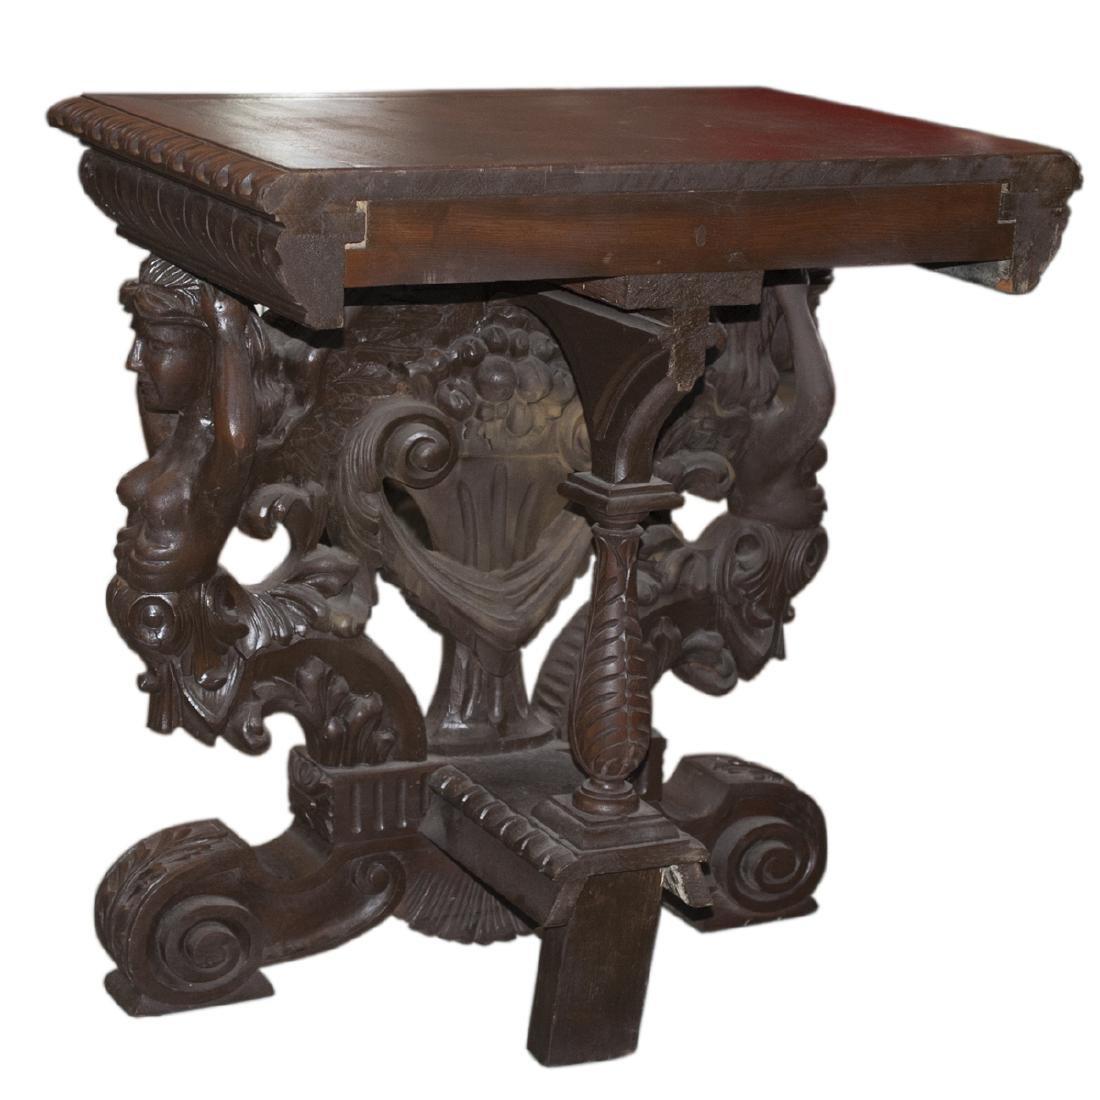 Wooden Figural Rococo Console Table - 2